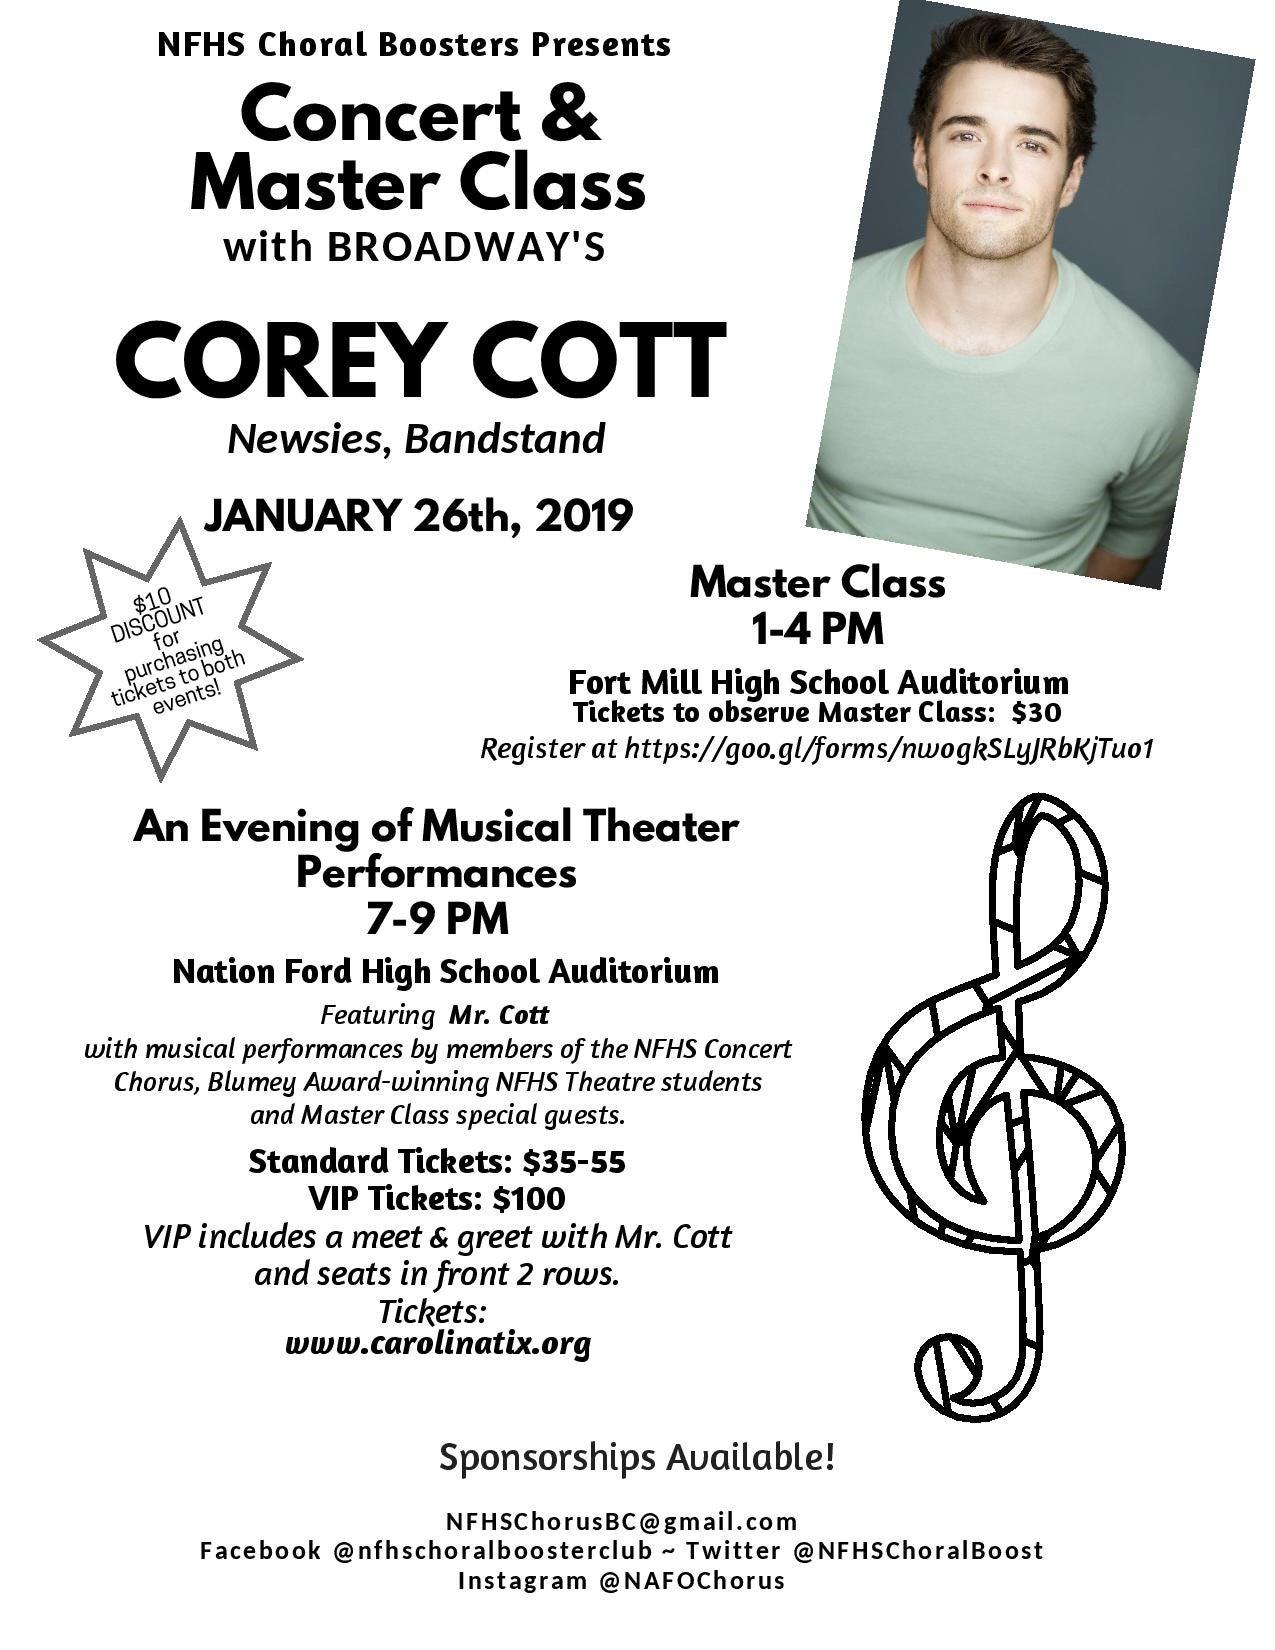 NFHS Student Concert featuring Corey Cott